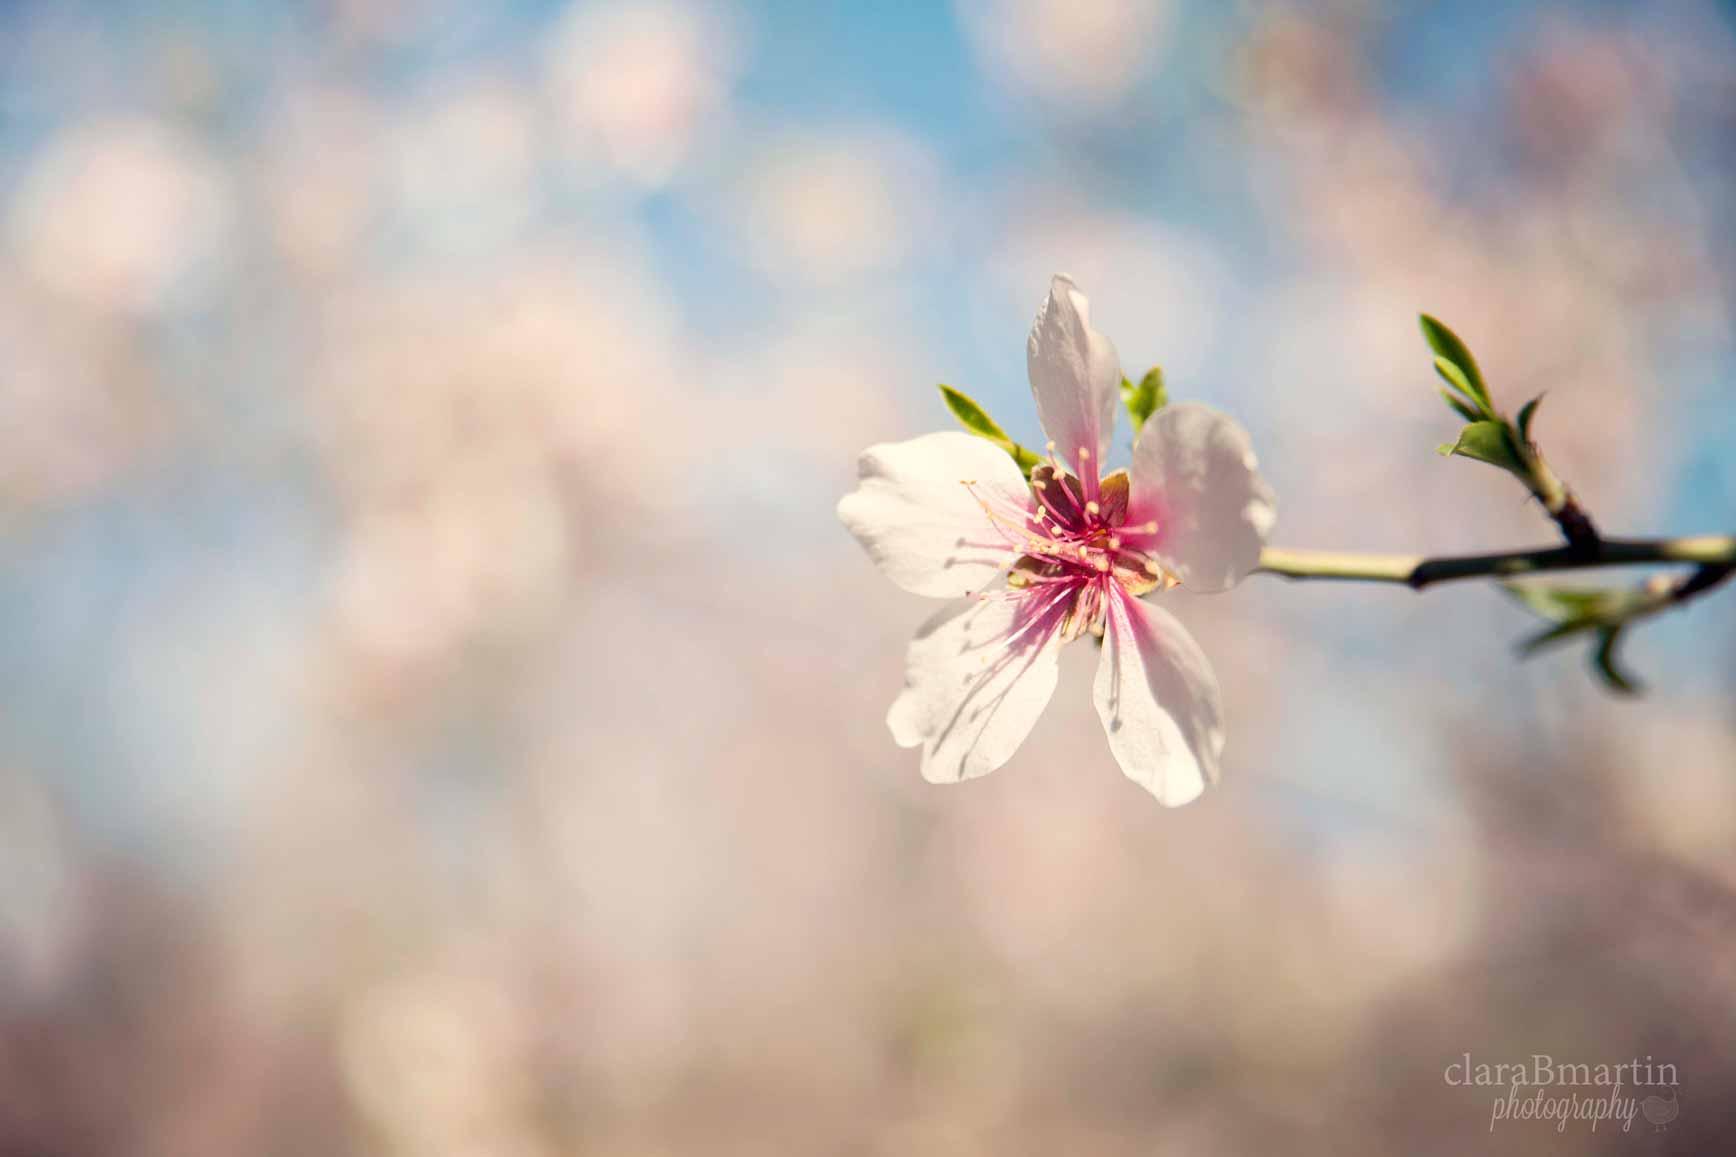 Primavera_claraBmartin05